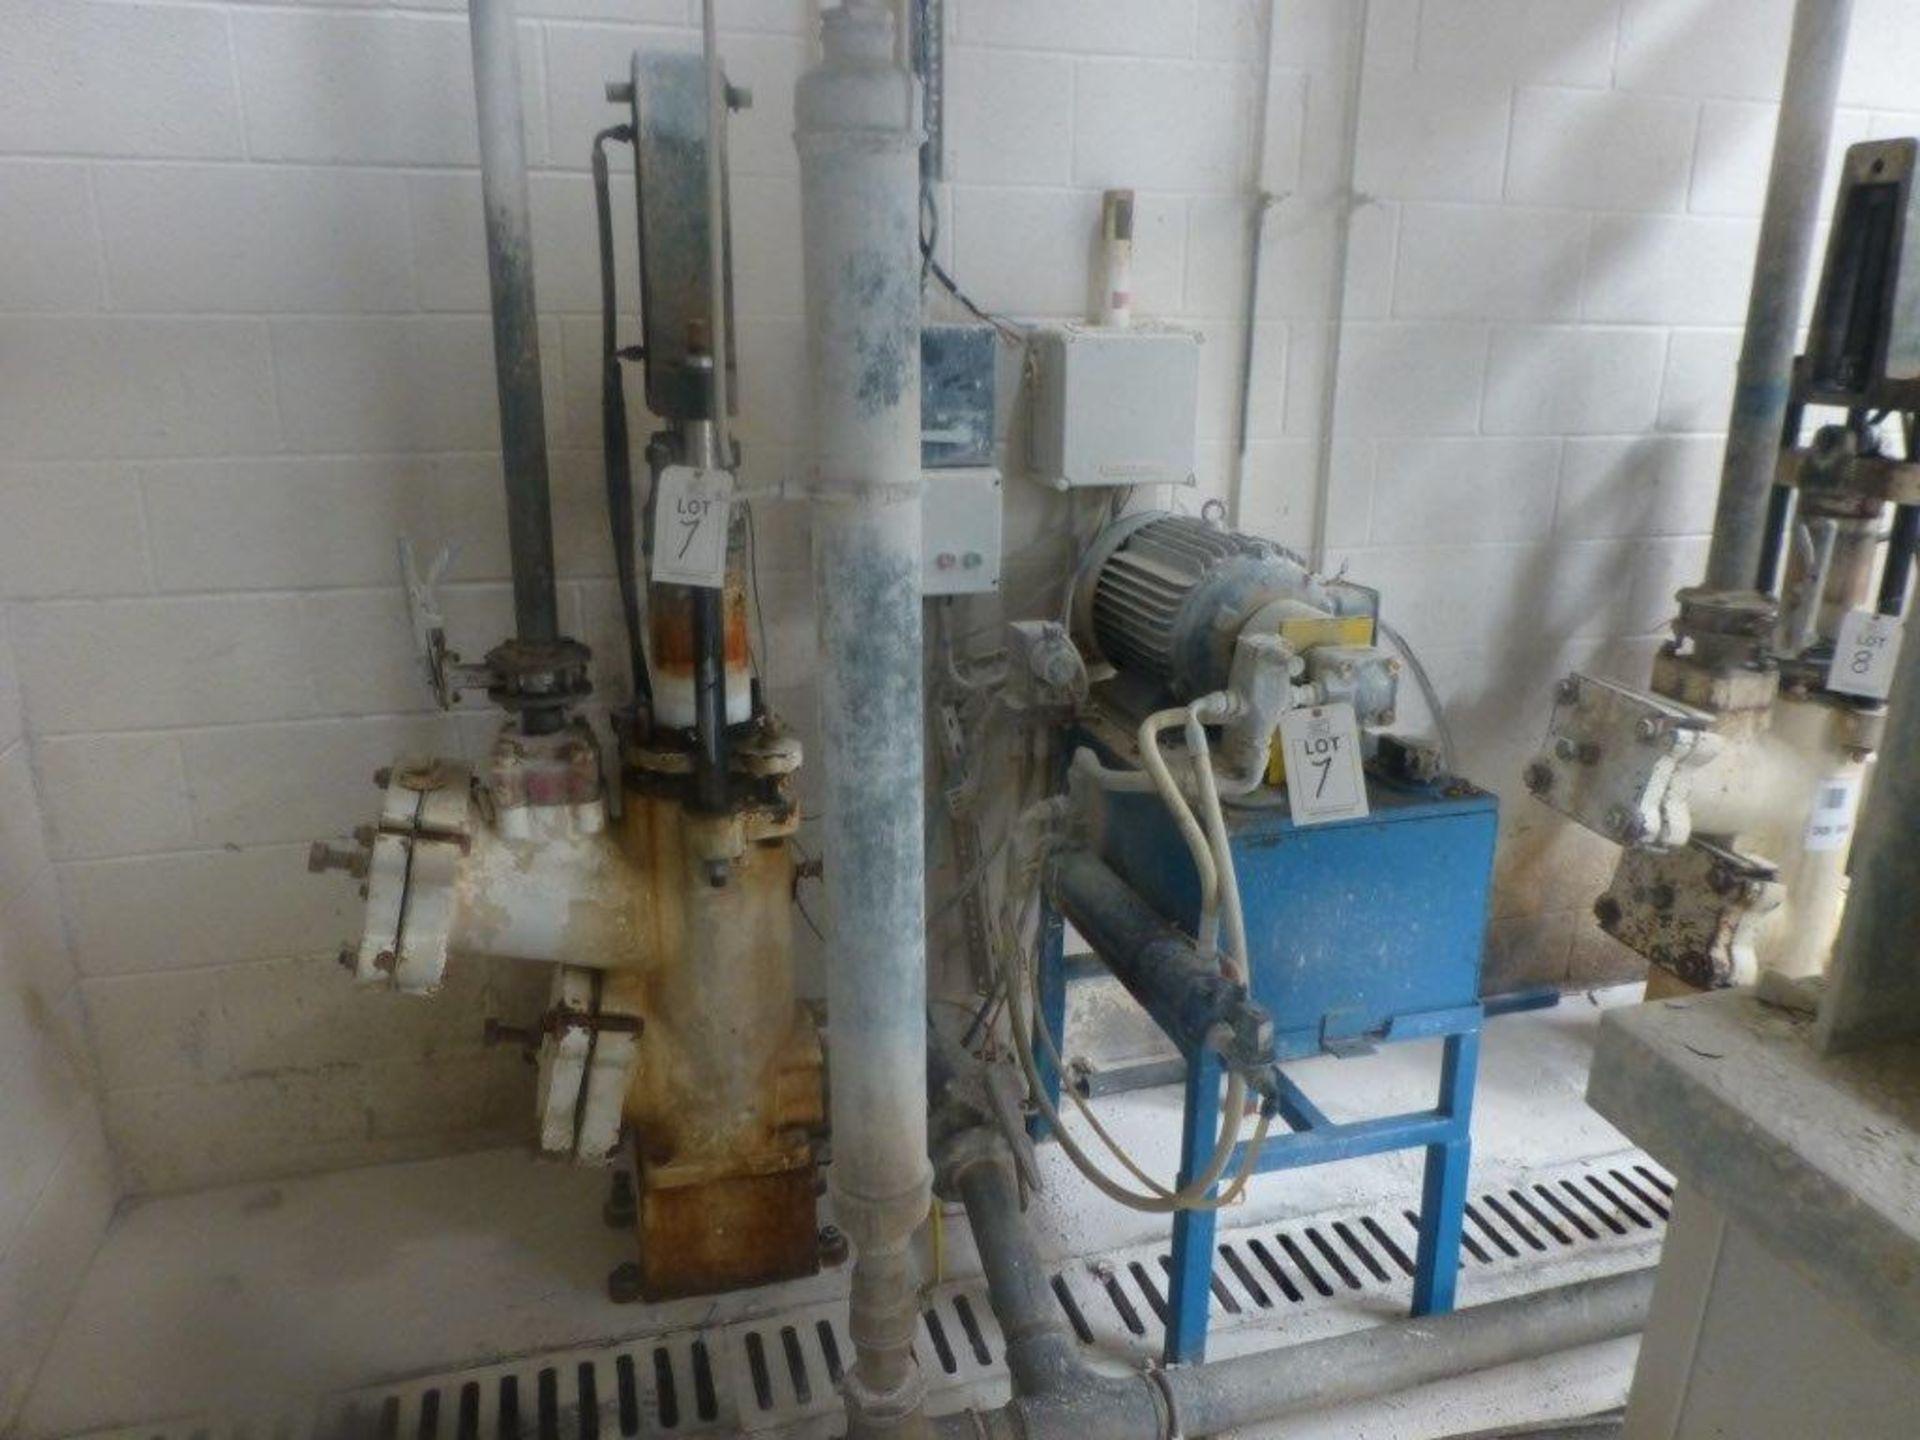 Lot 7 - William Boulton Type No 3 filter press, serial No FS-9409 (1982), Plant No SHP VIT PRESS 1 overall